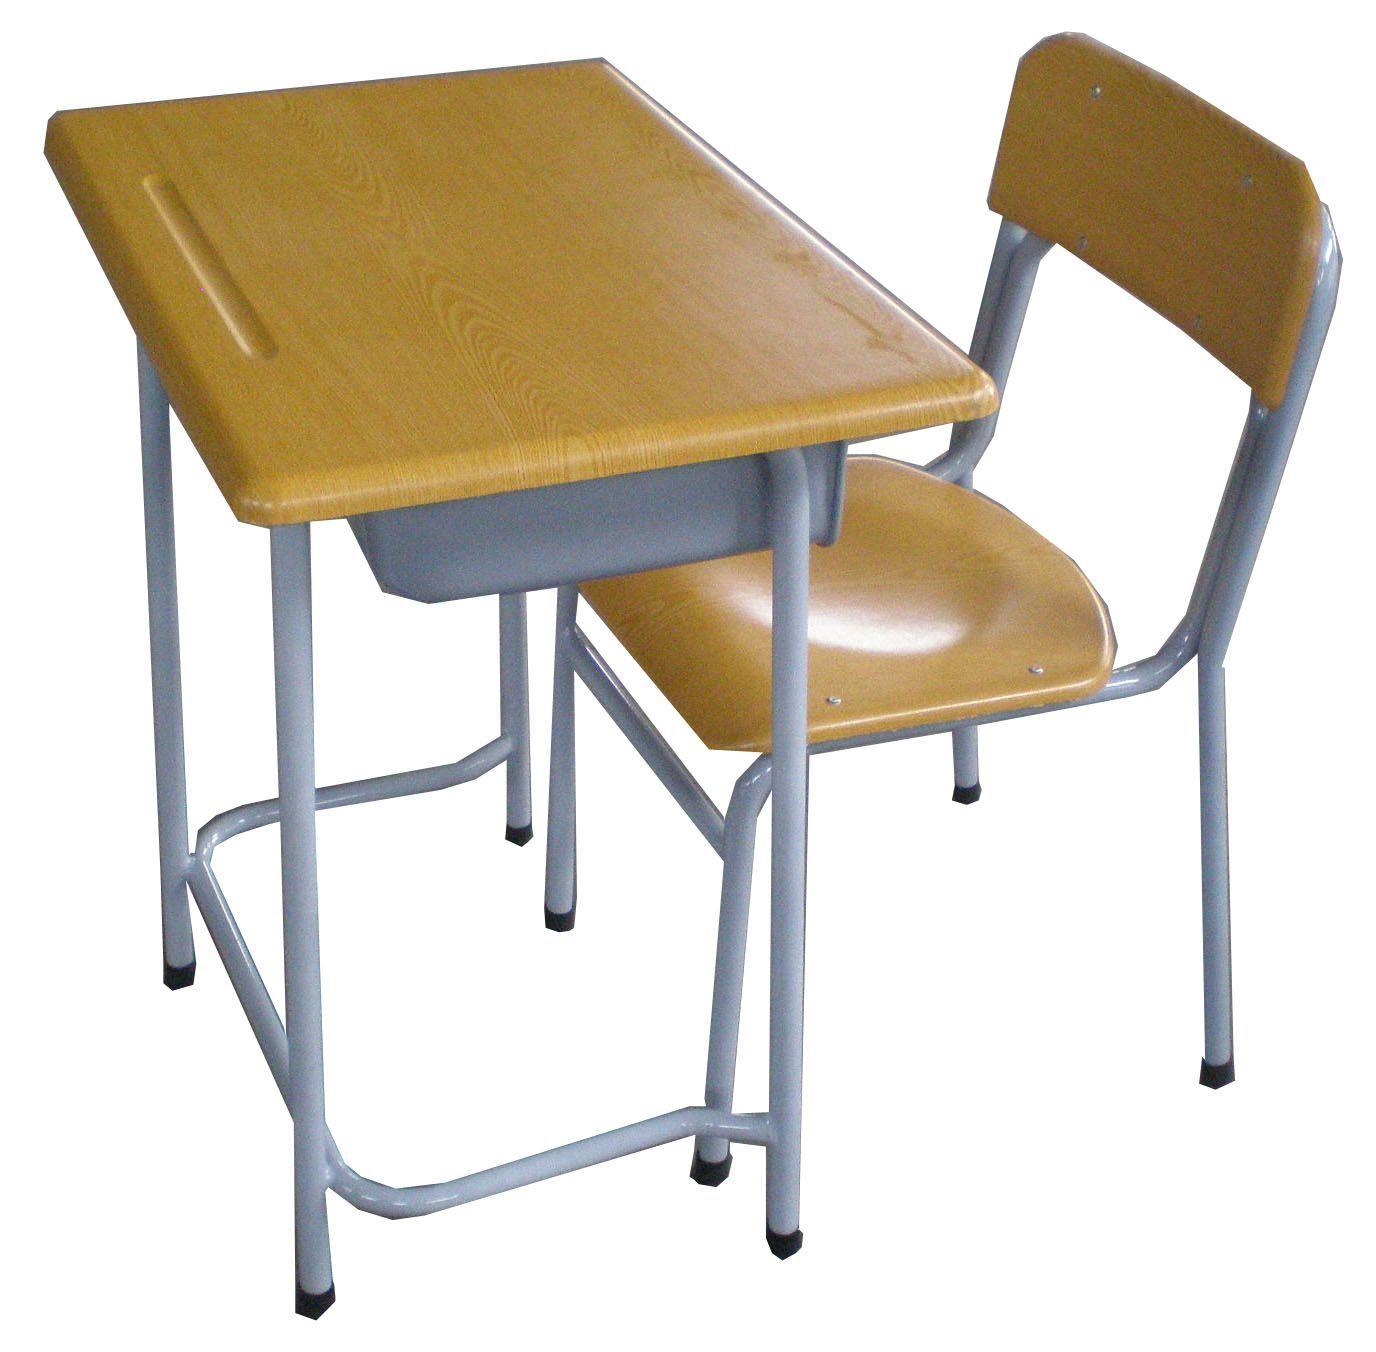 Modern School Desks Real Wood Home Office Furniture Check More